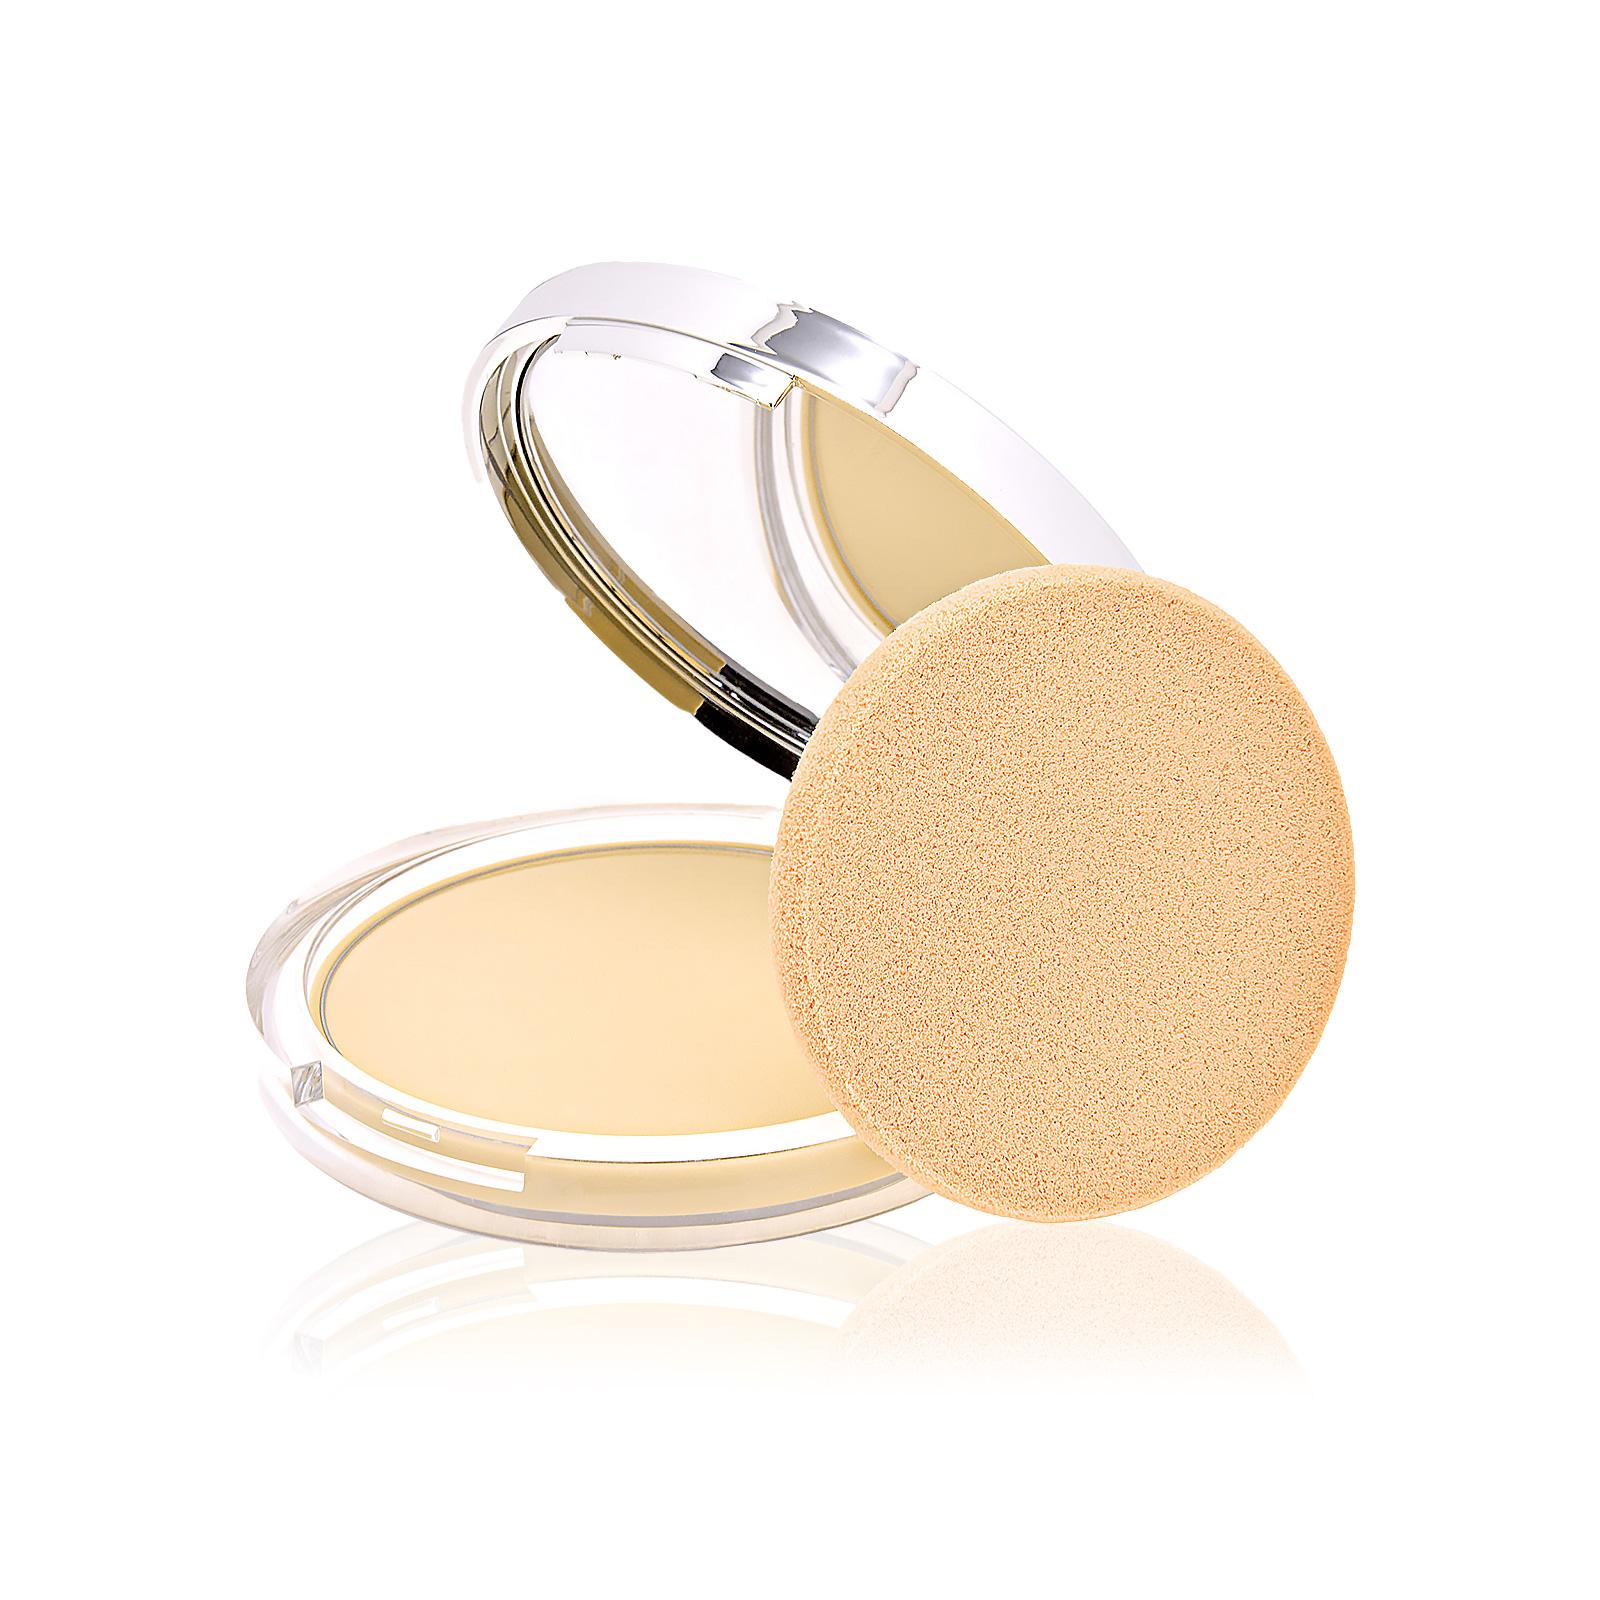 Stay-Matte Sheer Pressed Powder (All Skin Types)